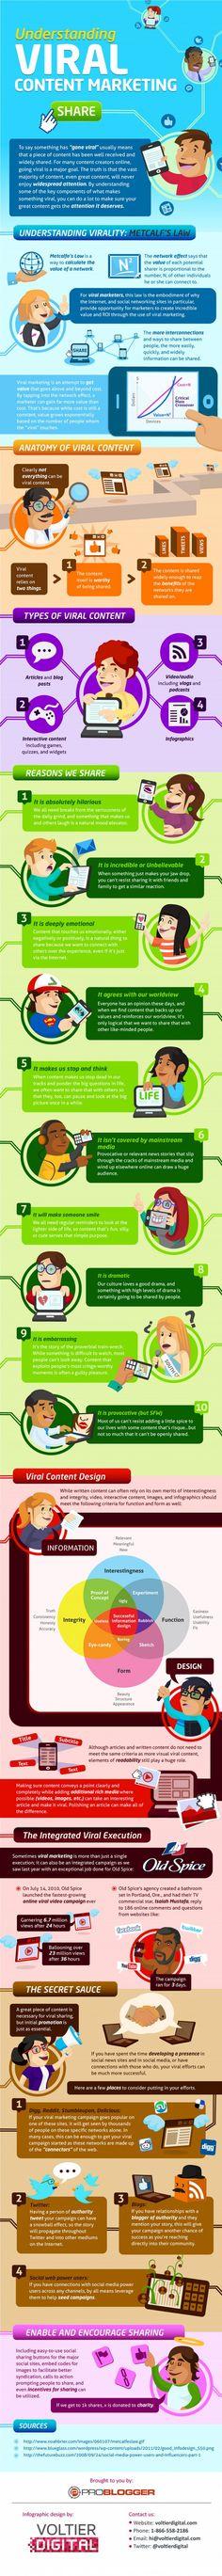 Understanding #Viral #Content #Marketing (Infographic)